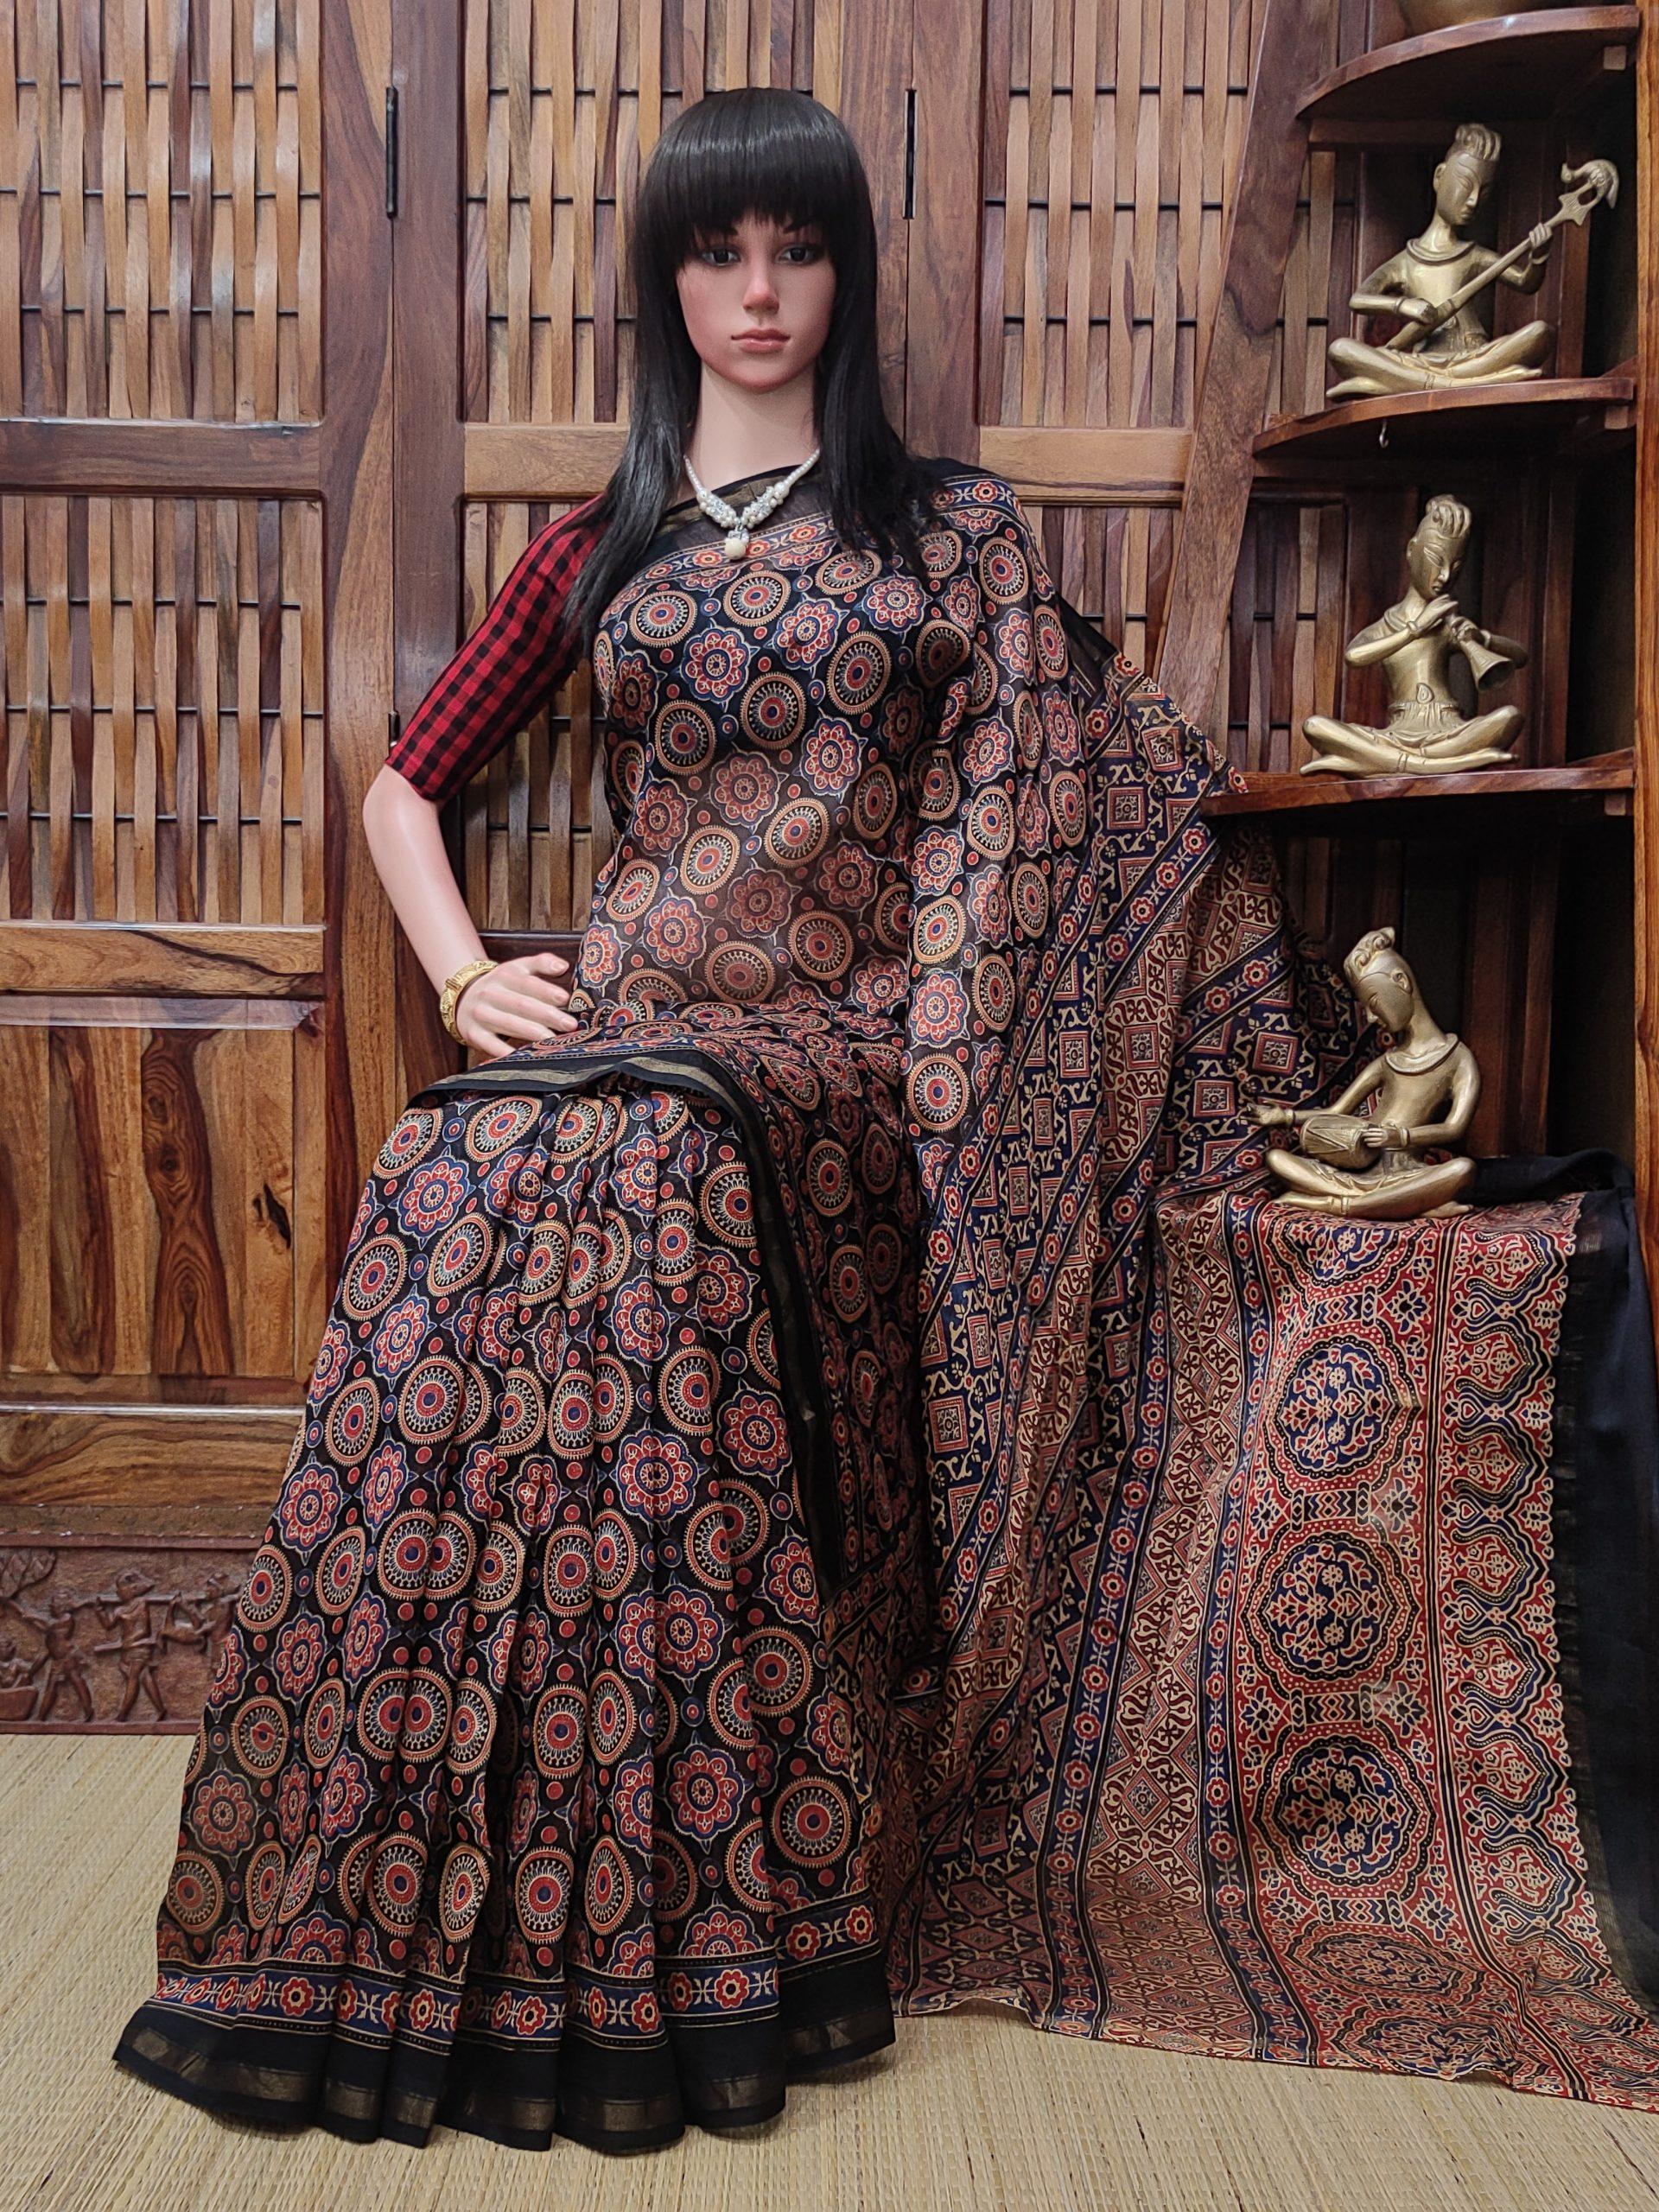 Chaithra - Chanderi Sico Saree